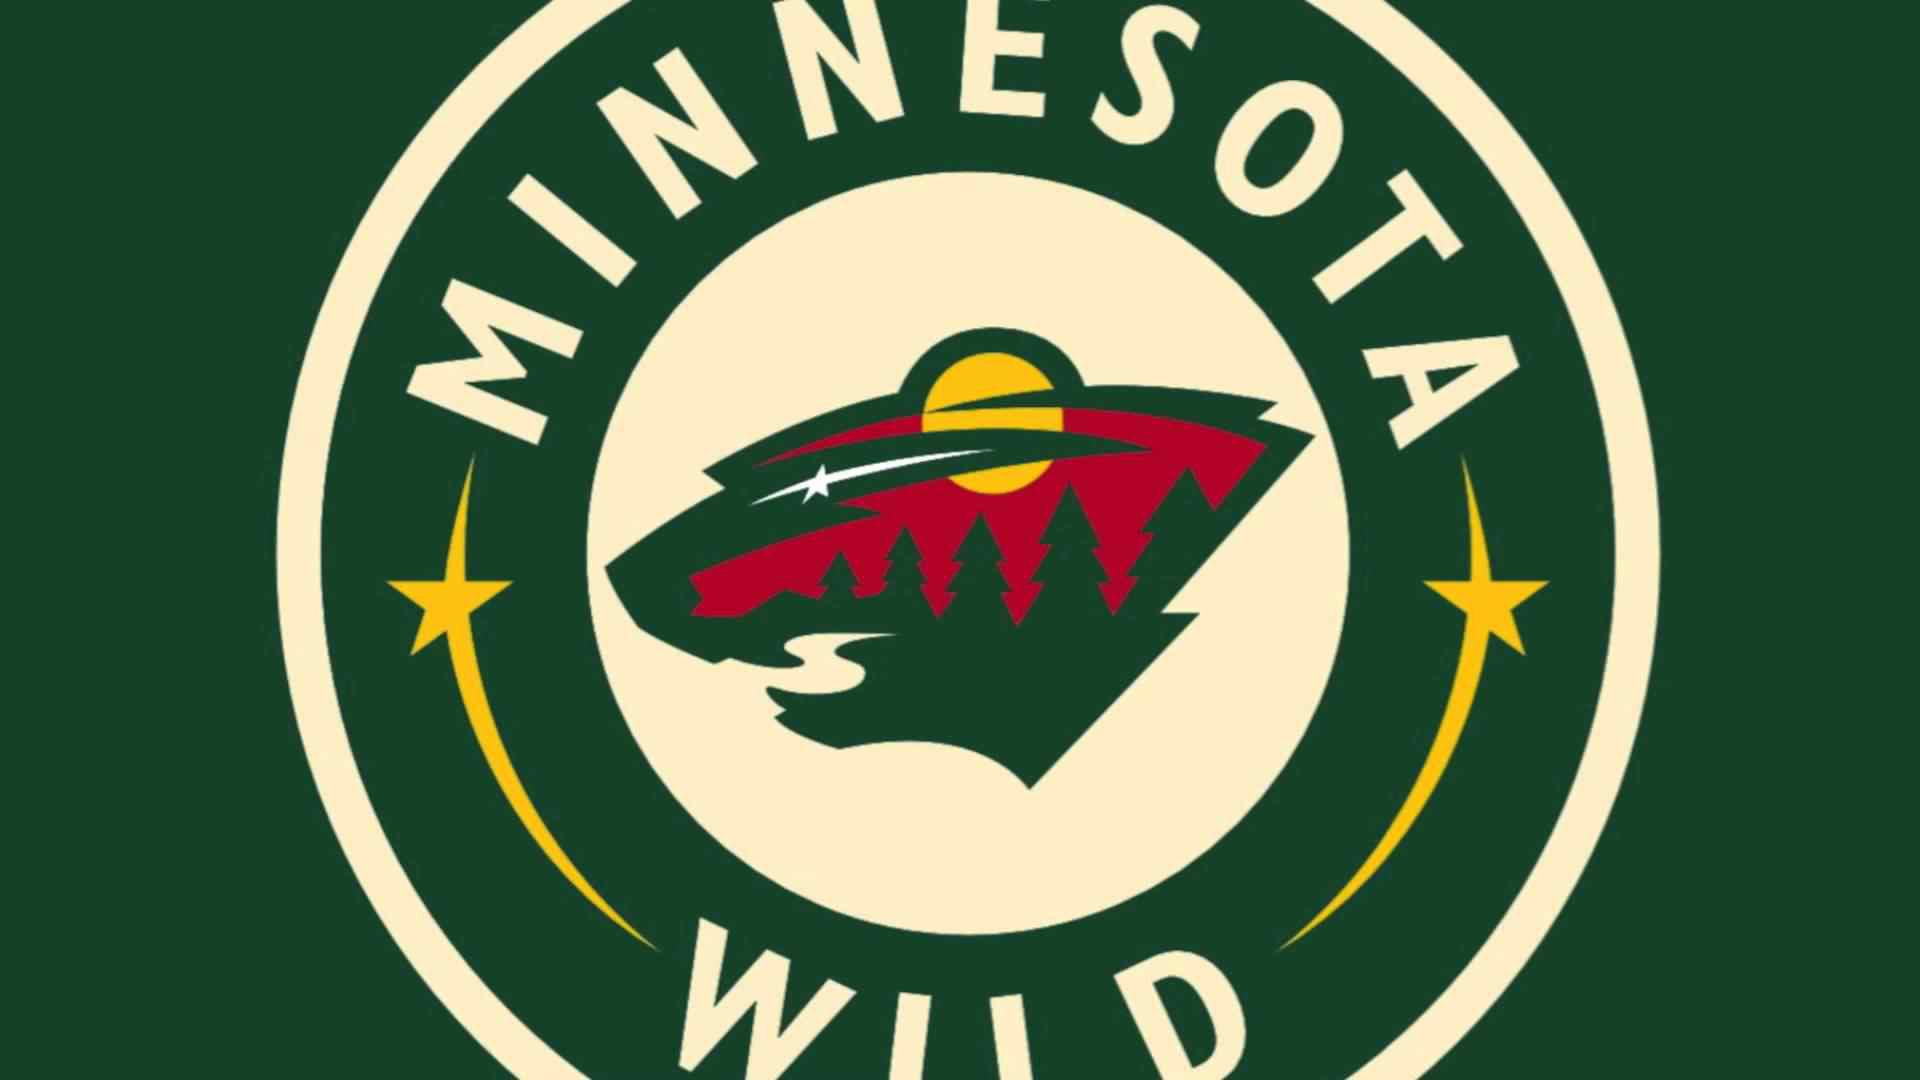 Minnesota Wild High Definition